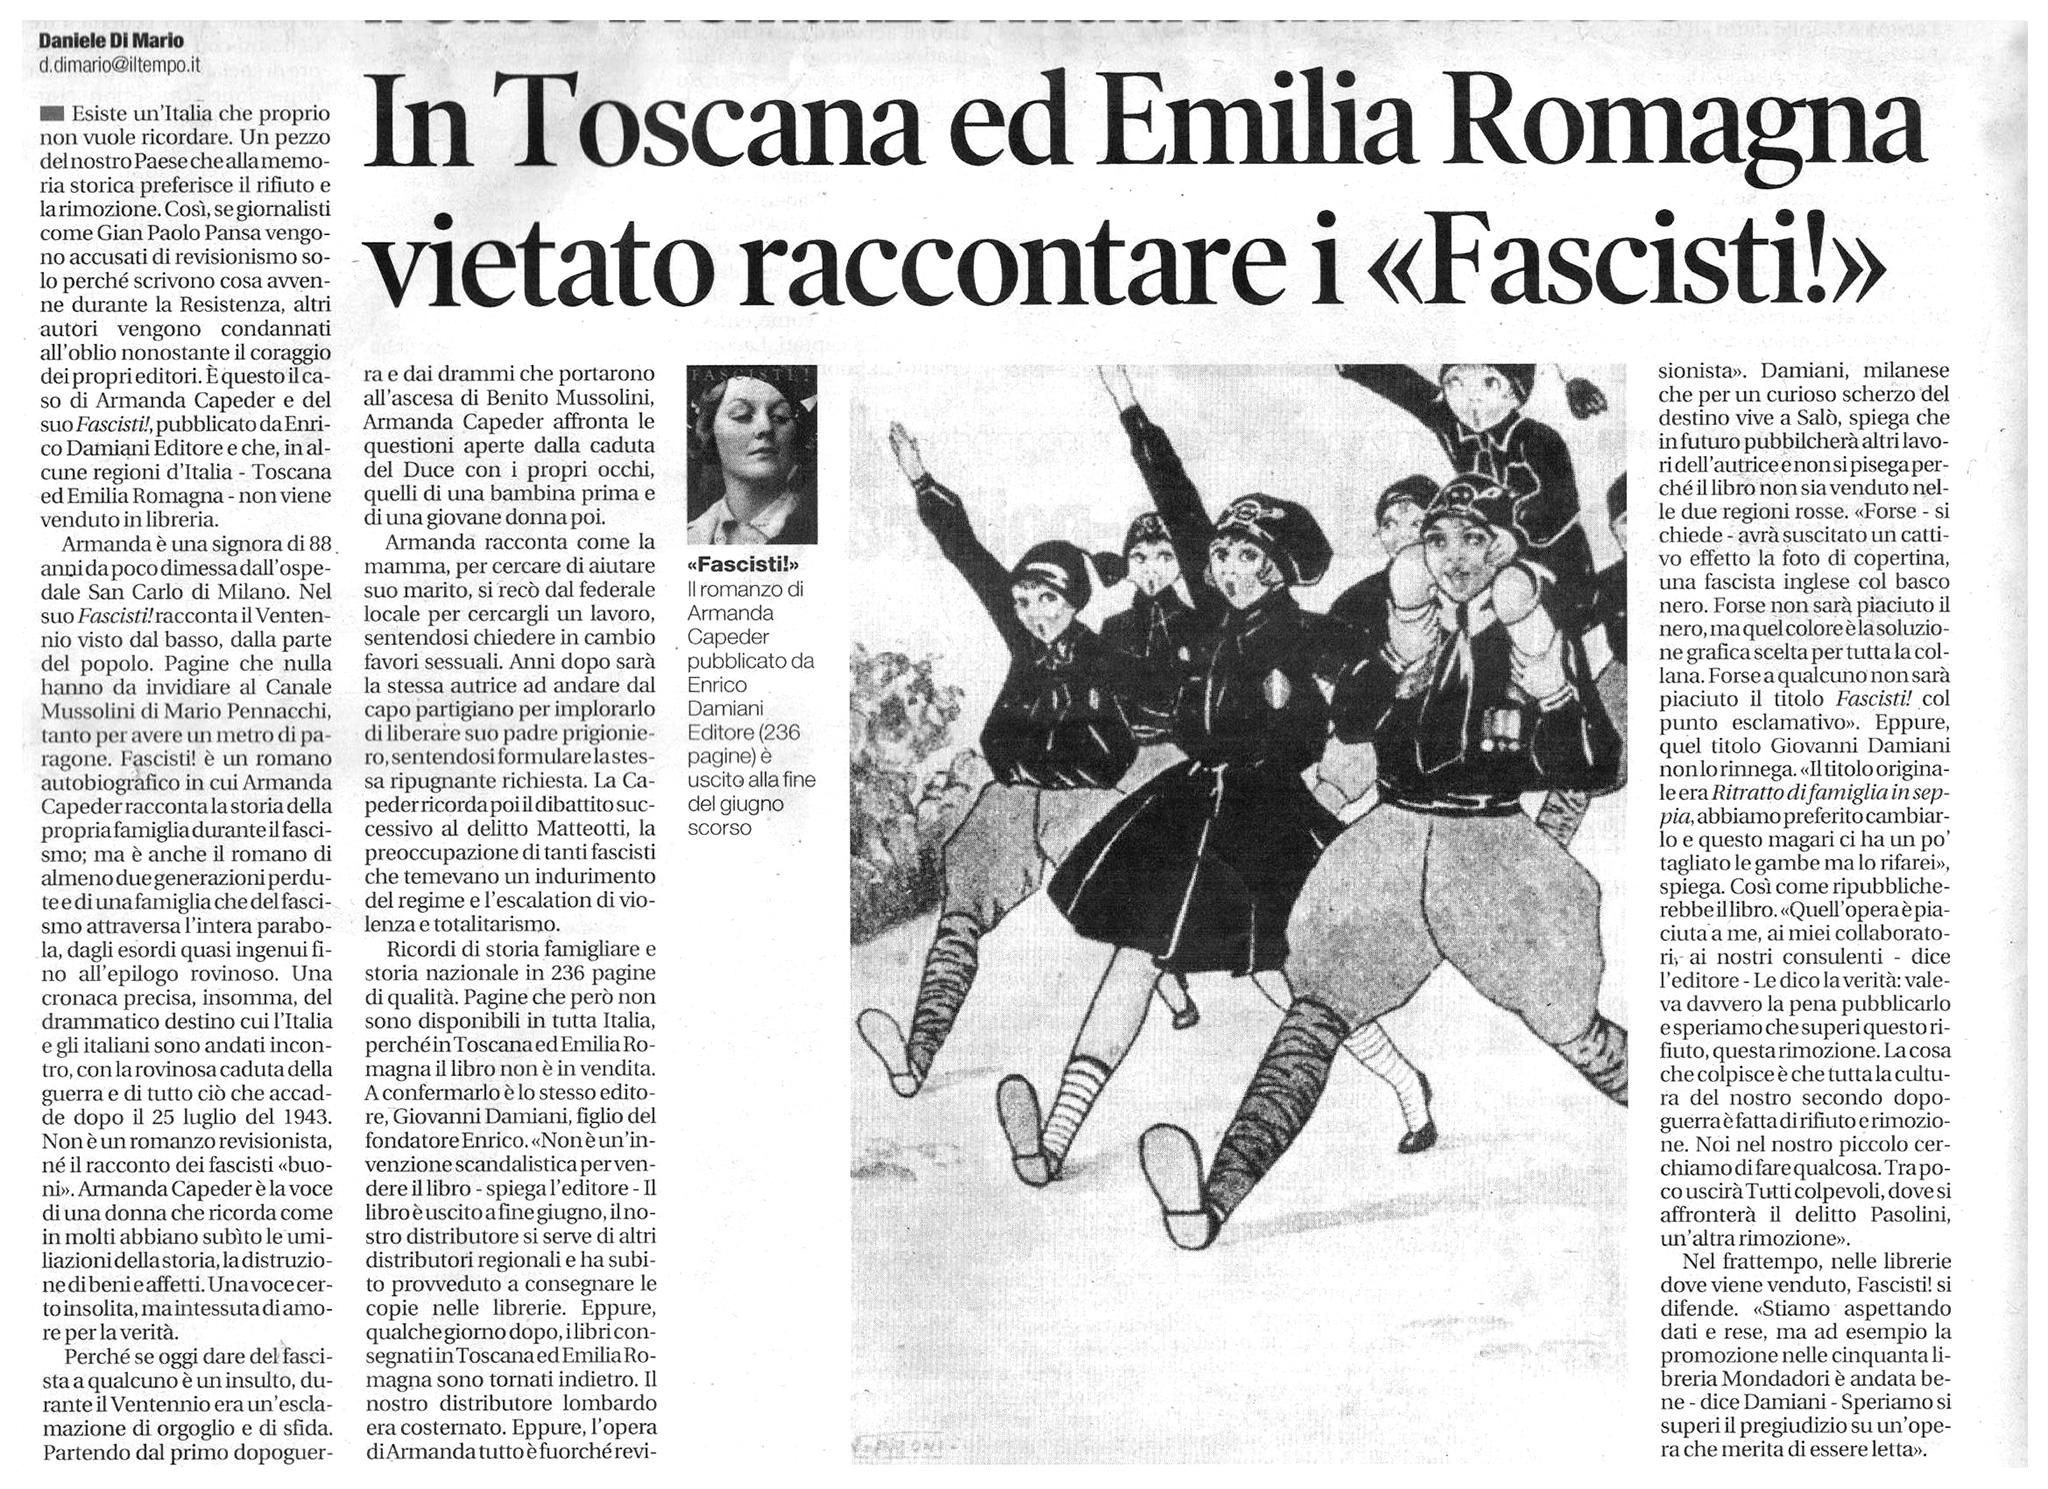 In toscana ed emilia Romagna vietato raccontare i Fascisti